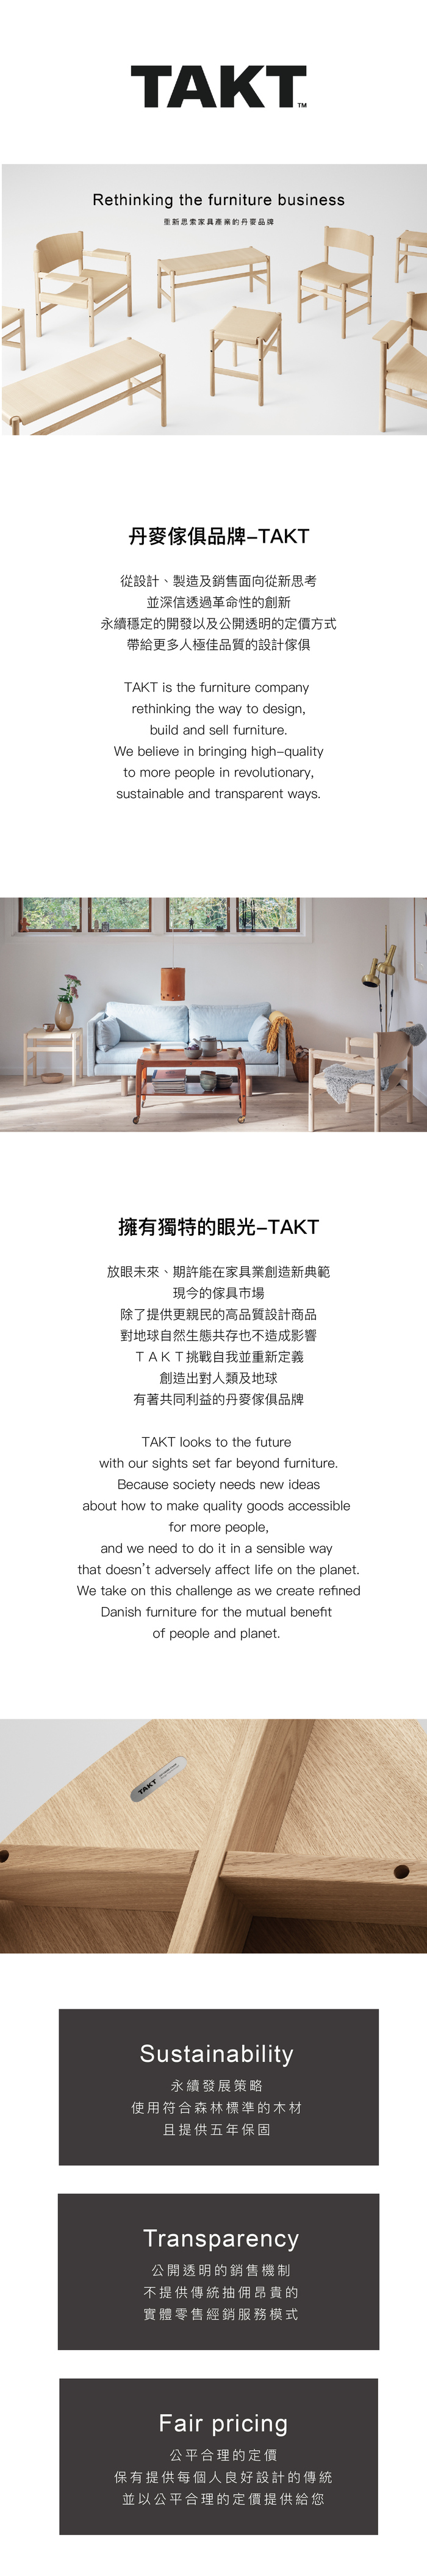 TAKT|丹麥家具品牌-T02 Soft Chair 環保梣木椅